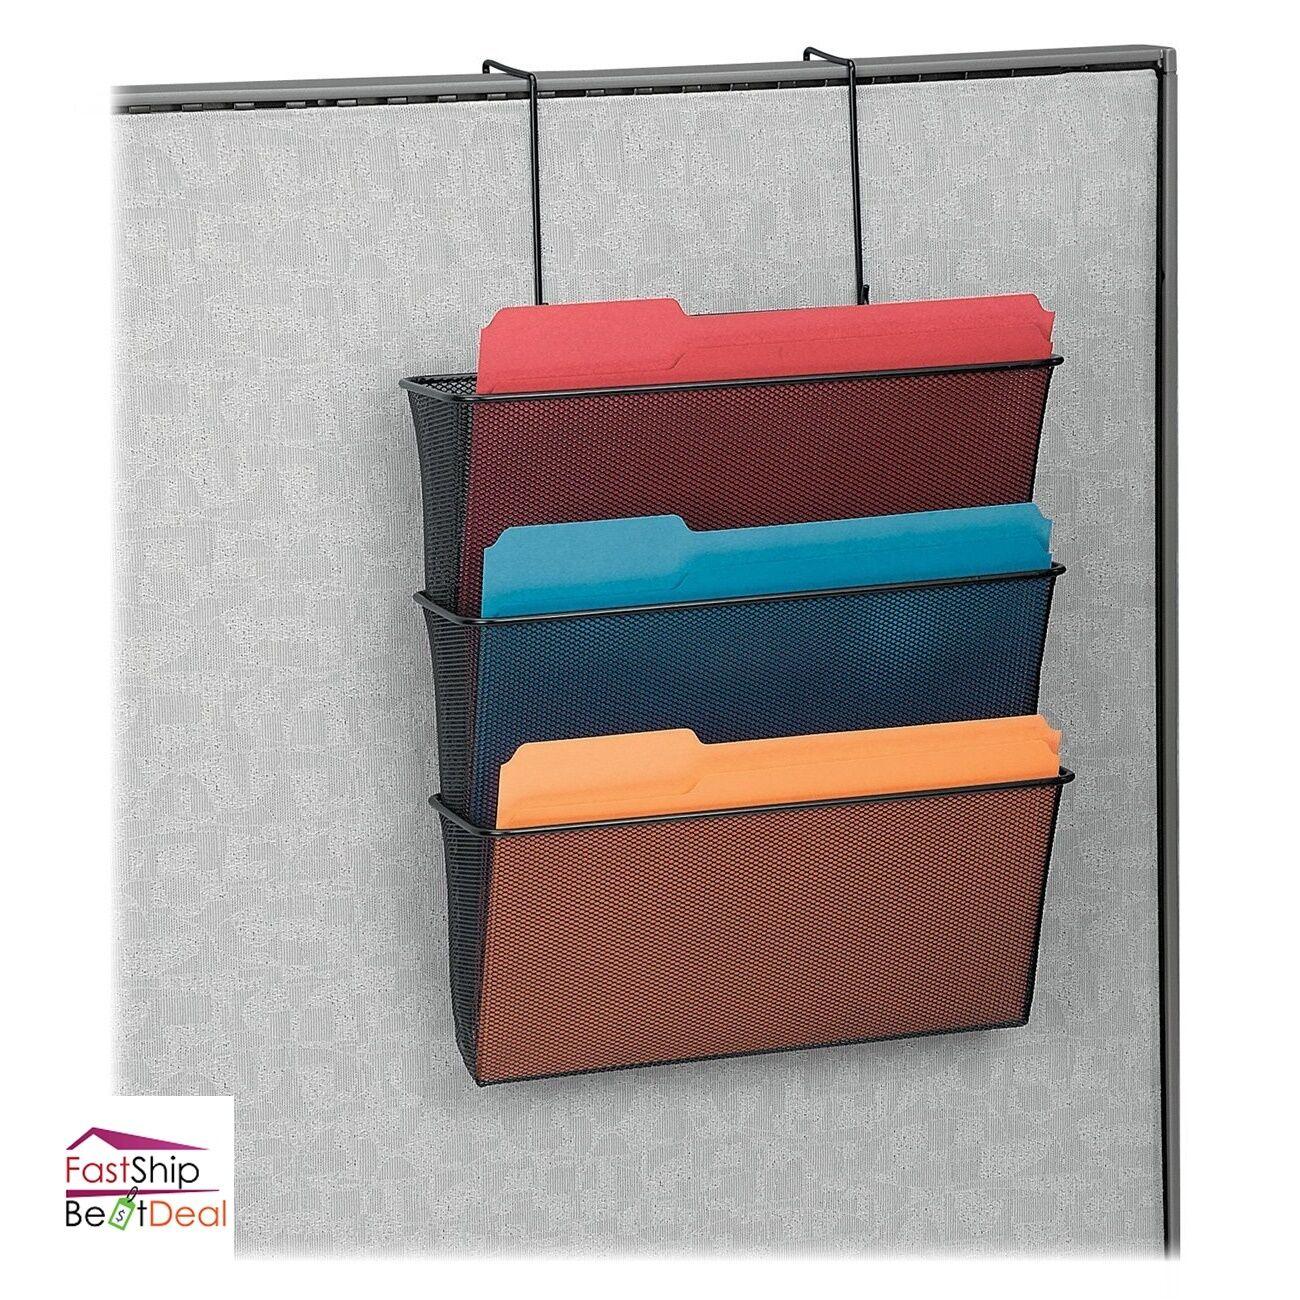 Wall Storage Office: Wall Mount Hanging File Folder Organizer 3 Pocket Office